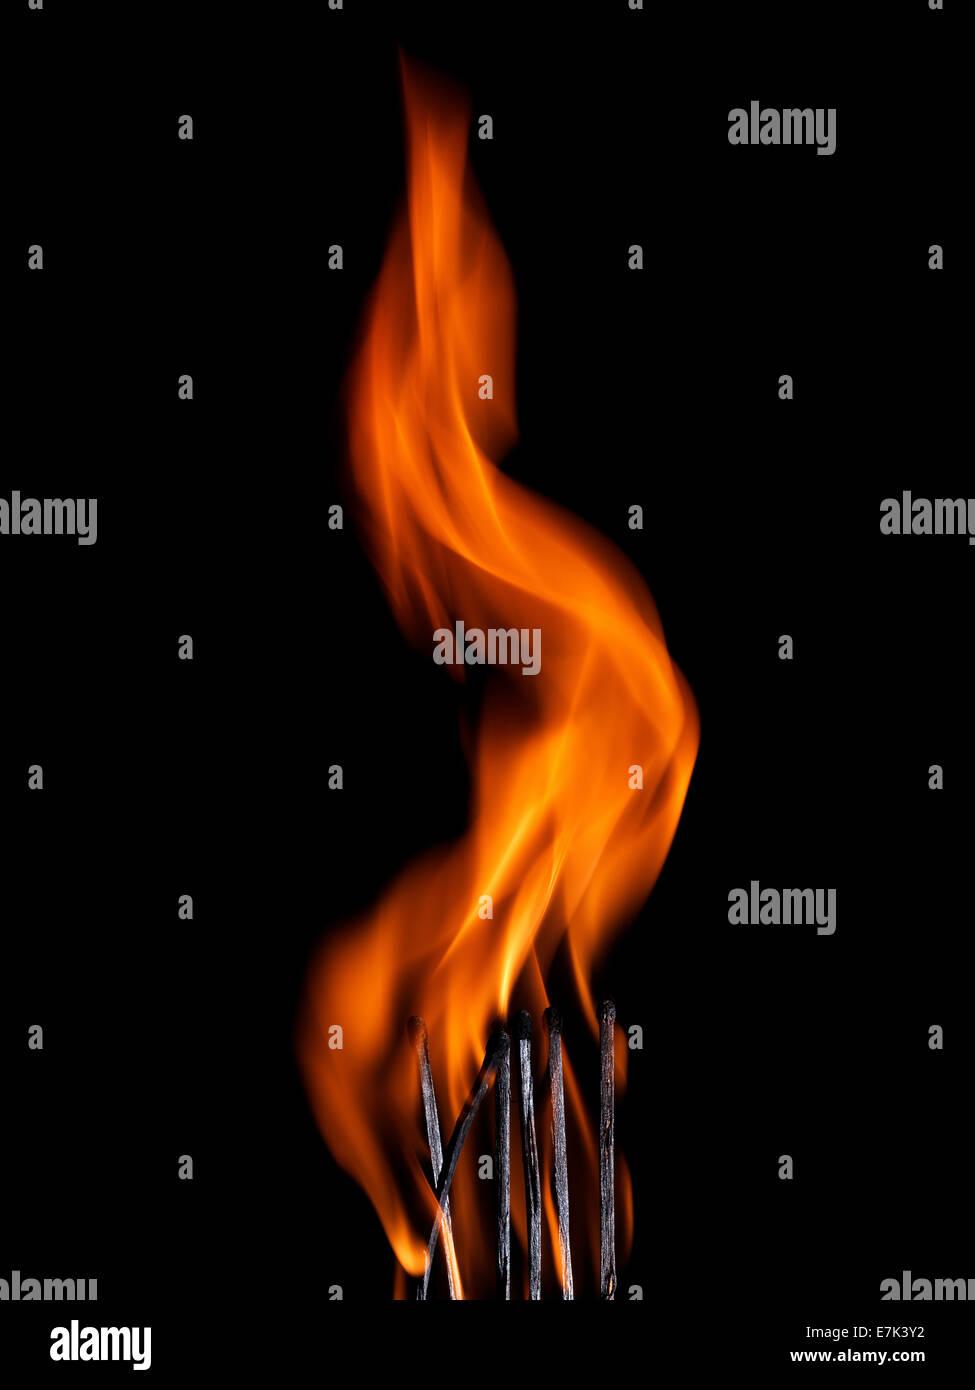 Macro shot of a flaming matchstick - Stock Image